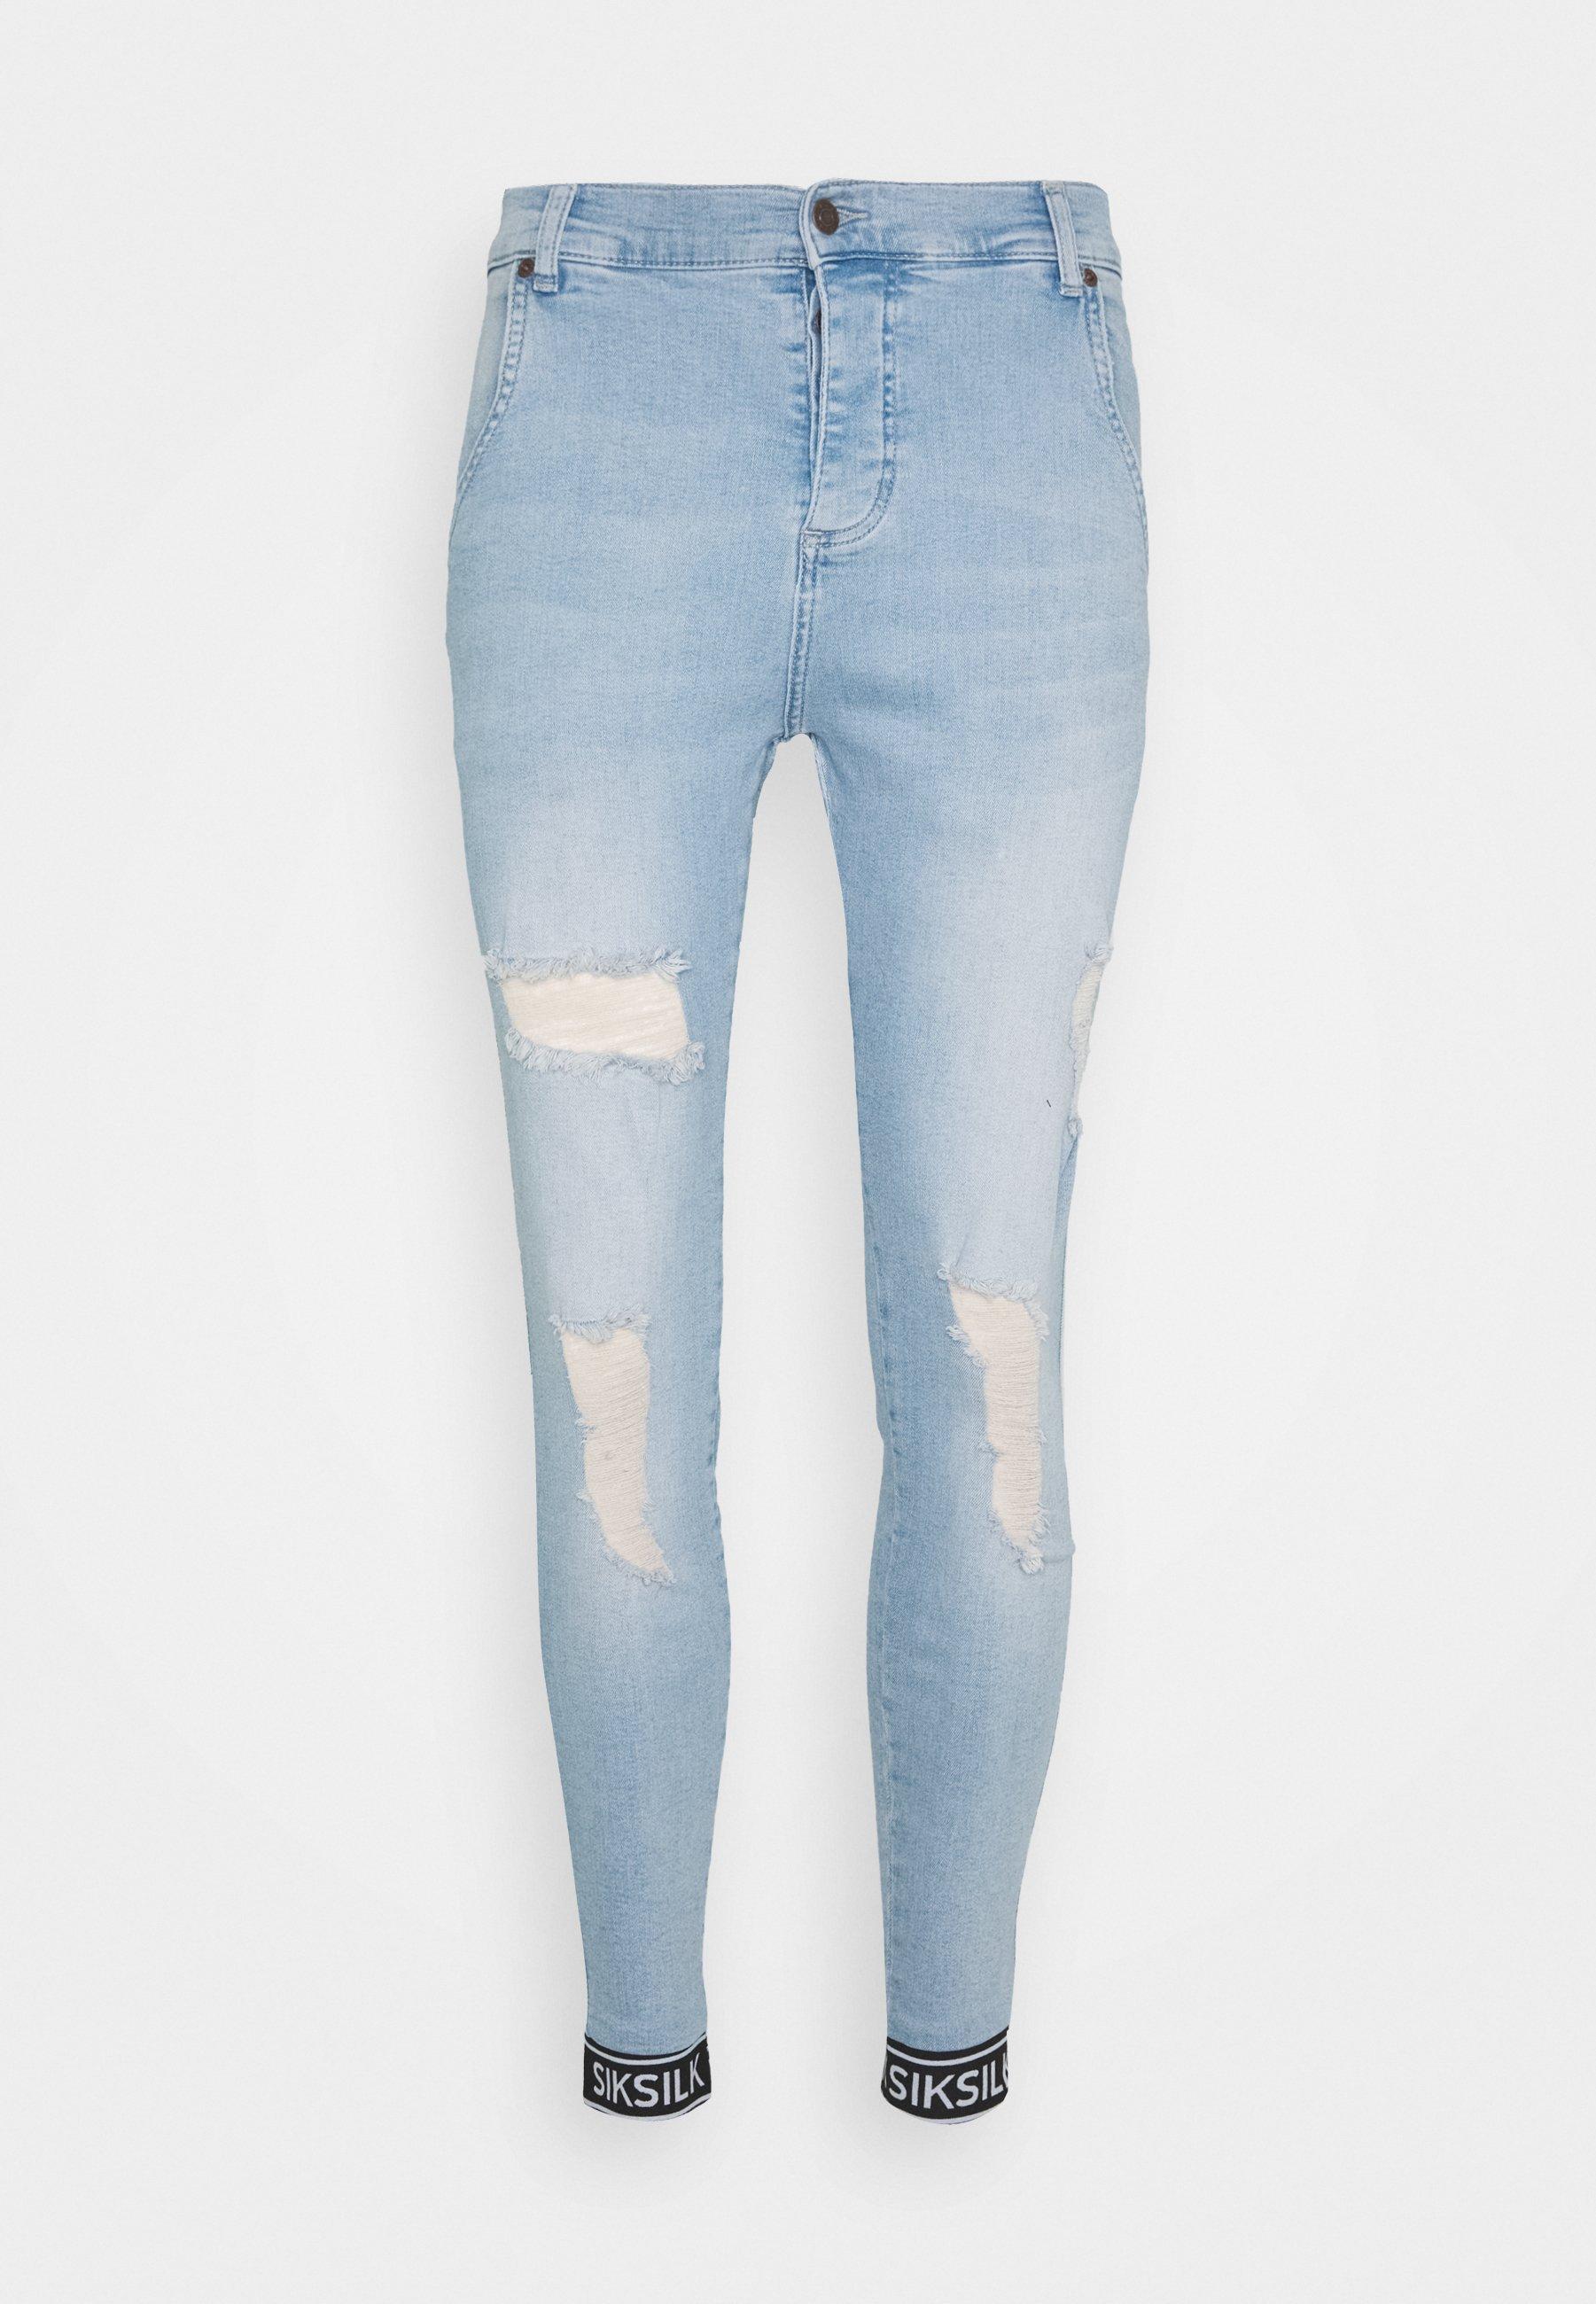 SIKSILK SKINNY CUFFED JEANS - Jeans Skinny - light blue